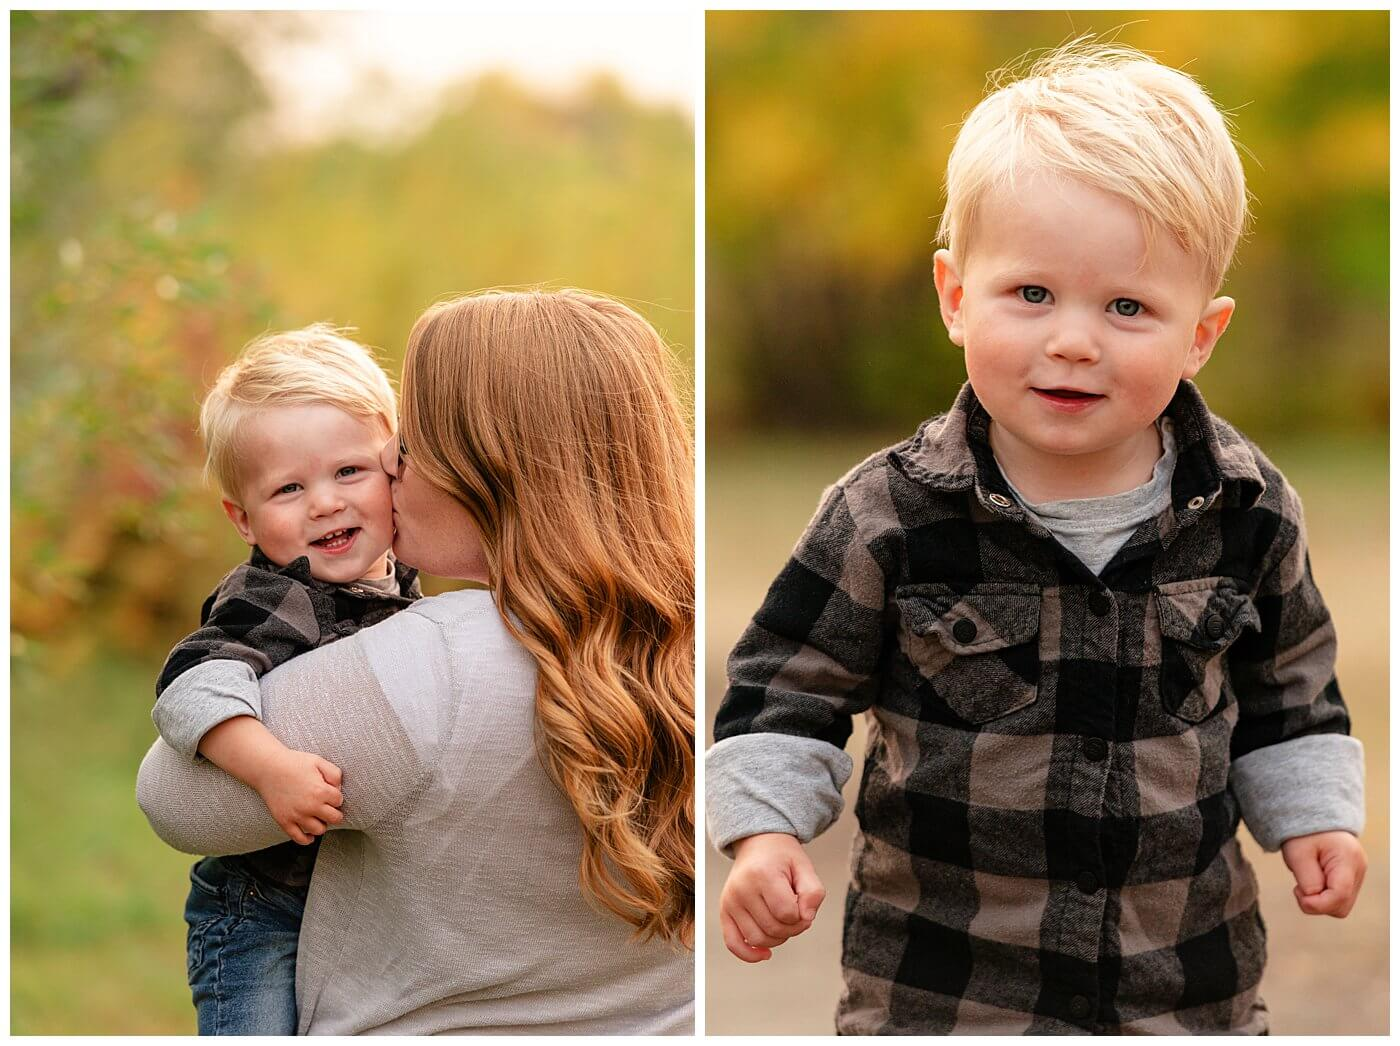 Liske Family 2020 - Science Centre - 004 - Cutest little boy